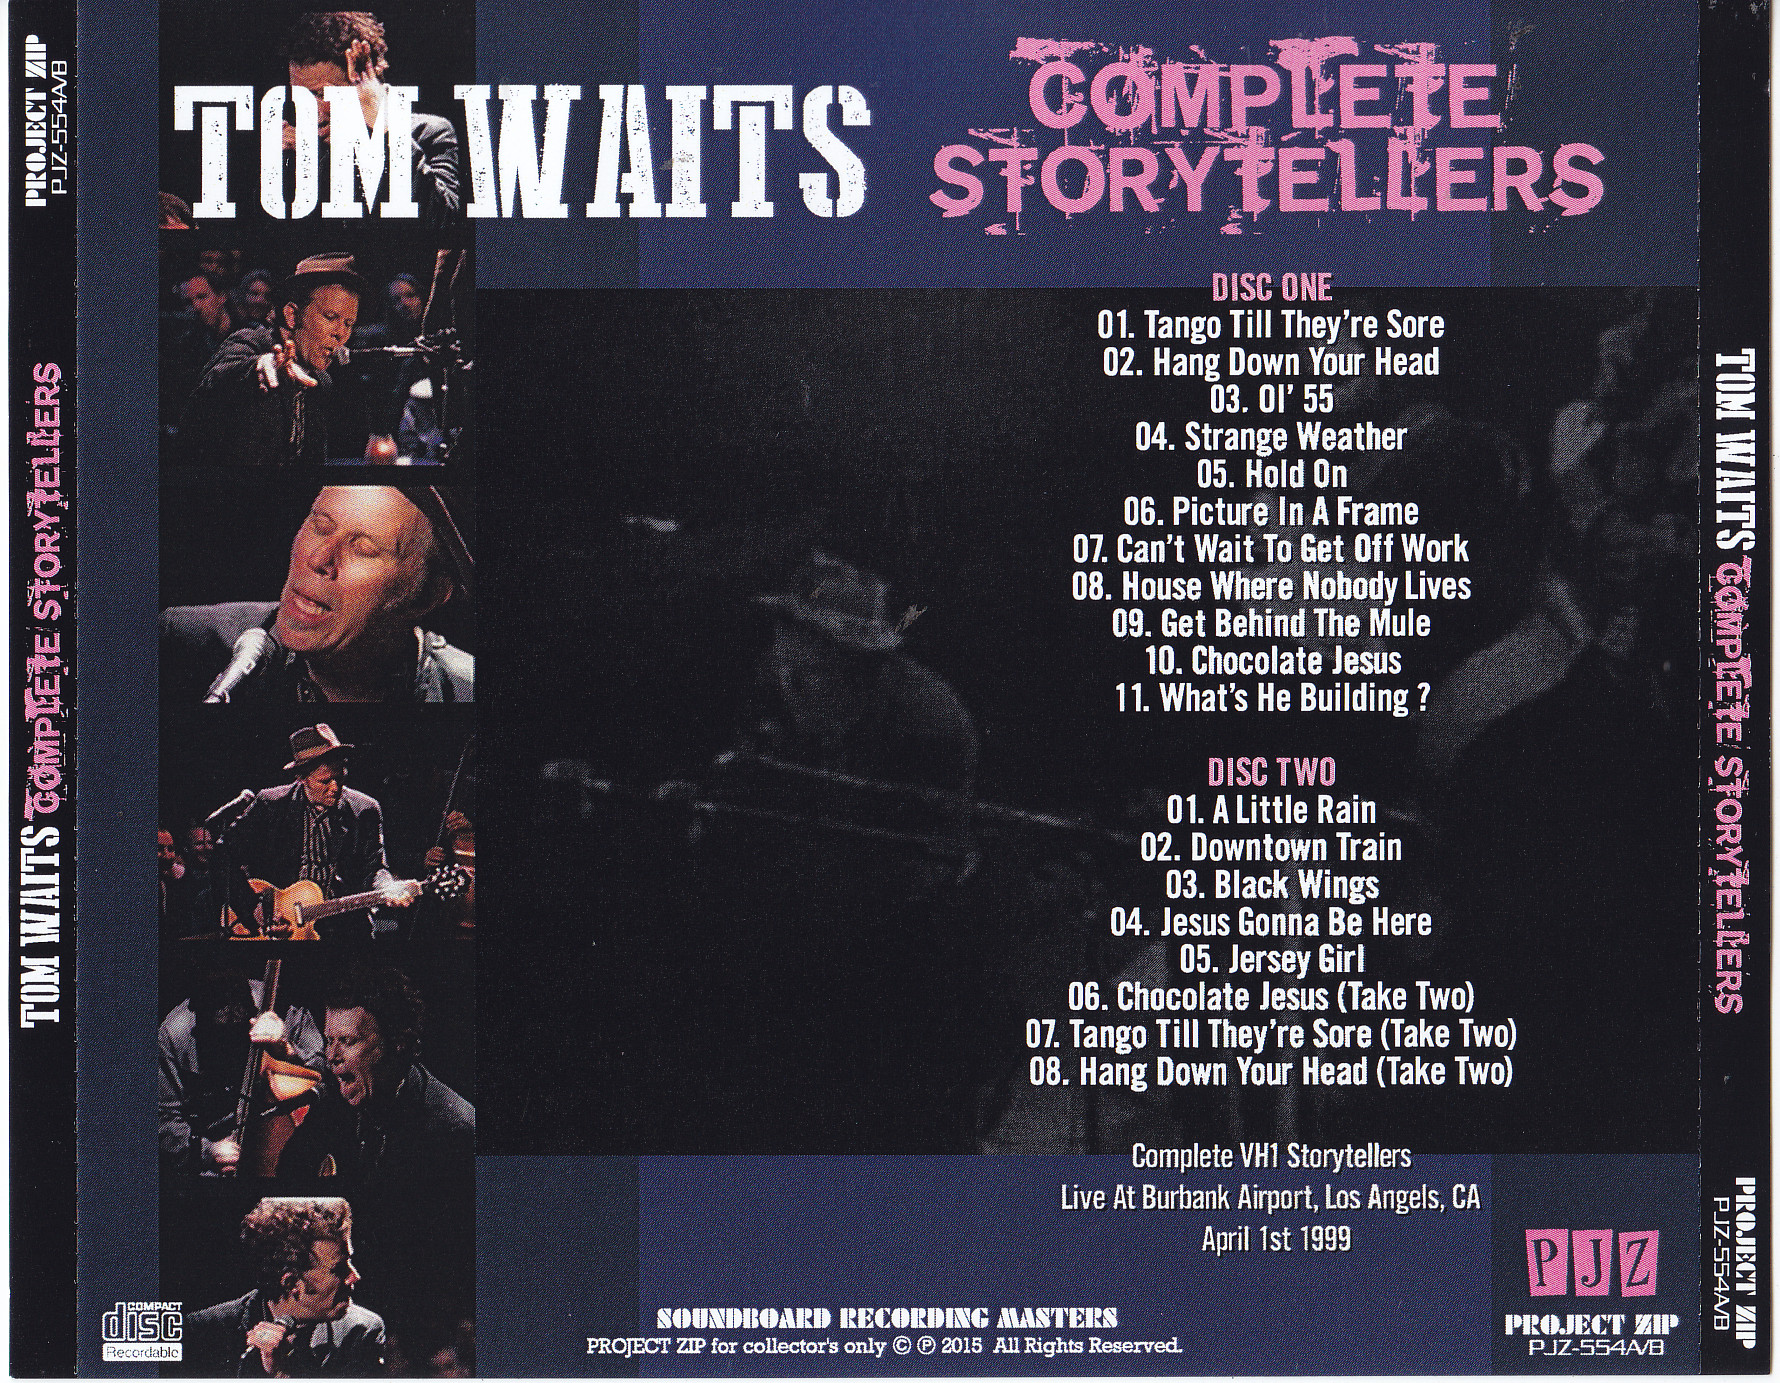 Tom Waits / Complete Storytellers / 2CDR – GiGinJapan